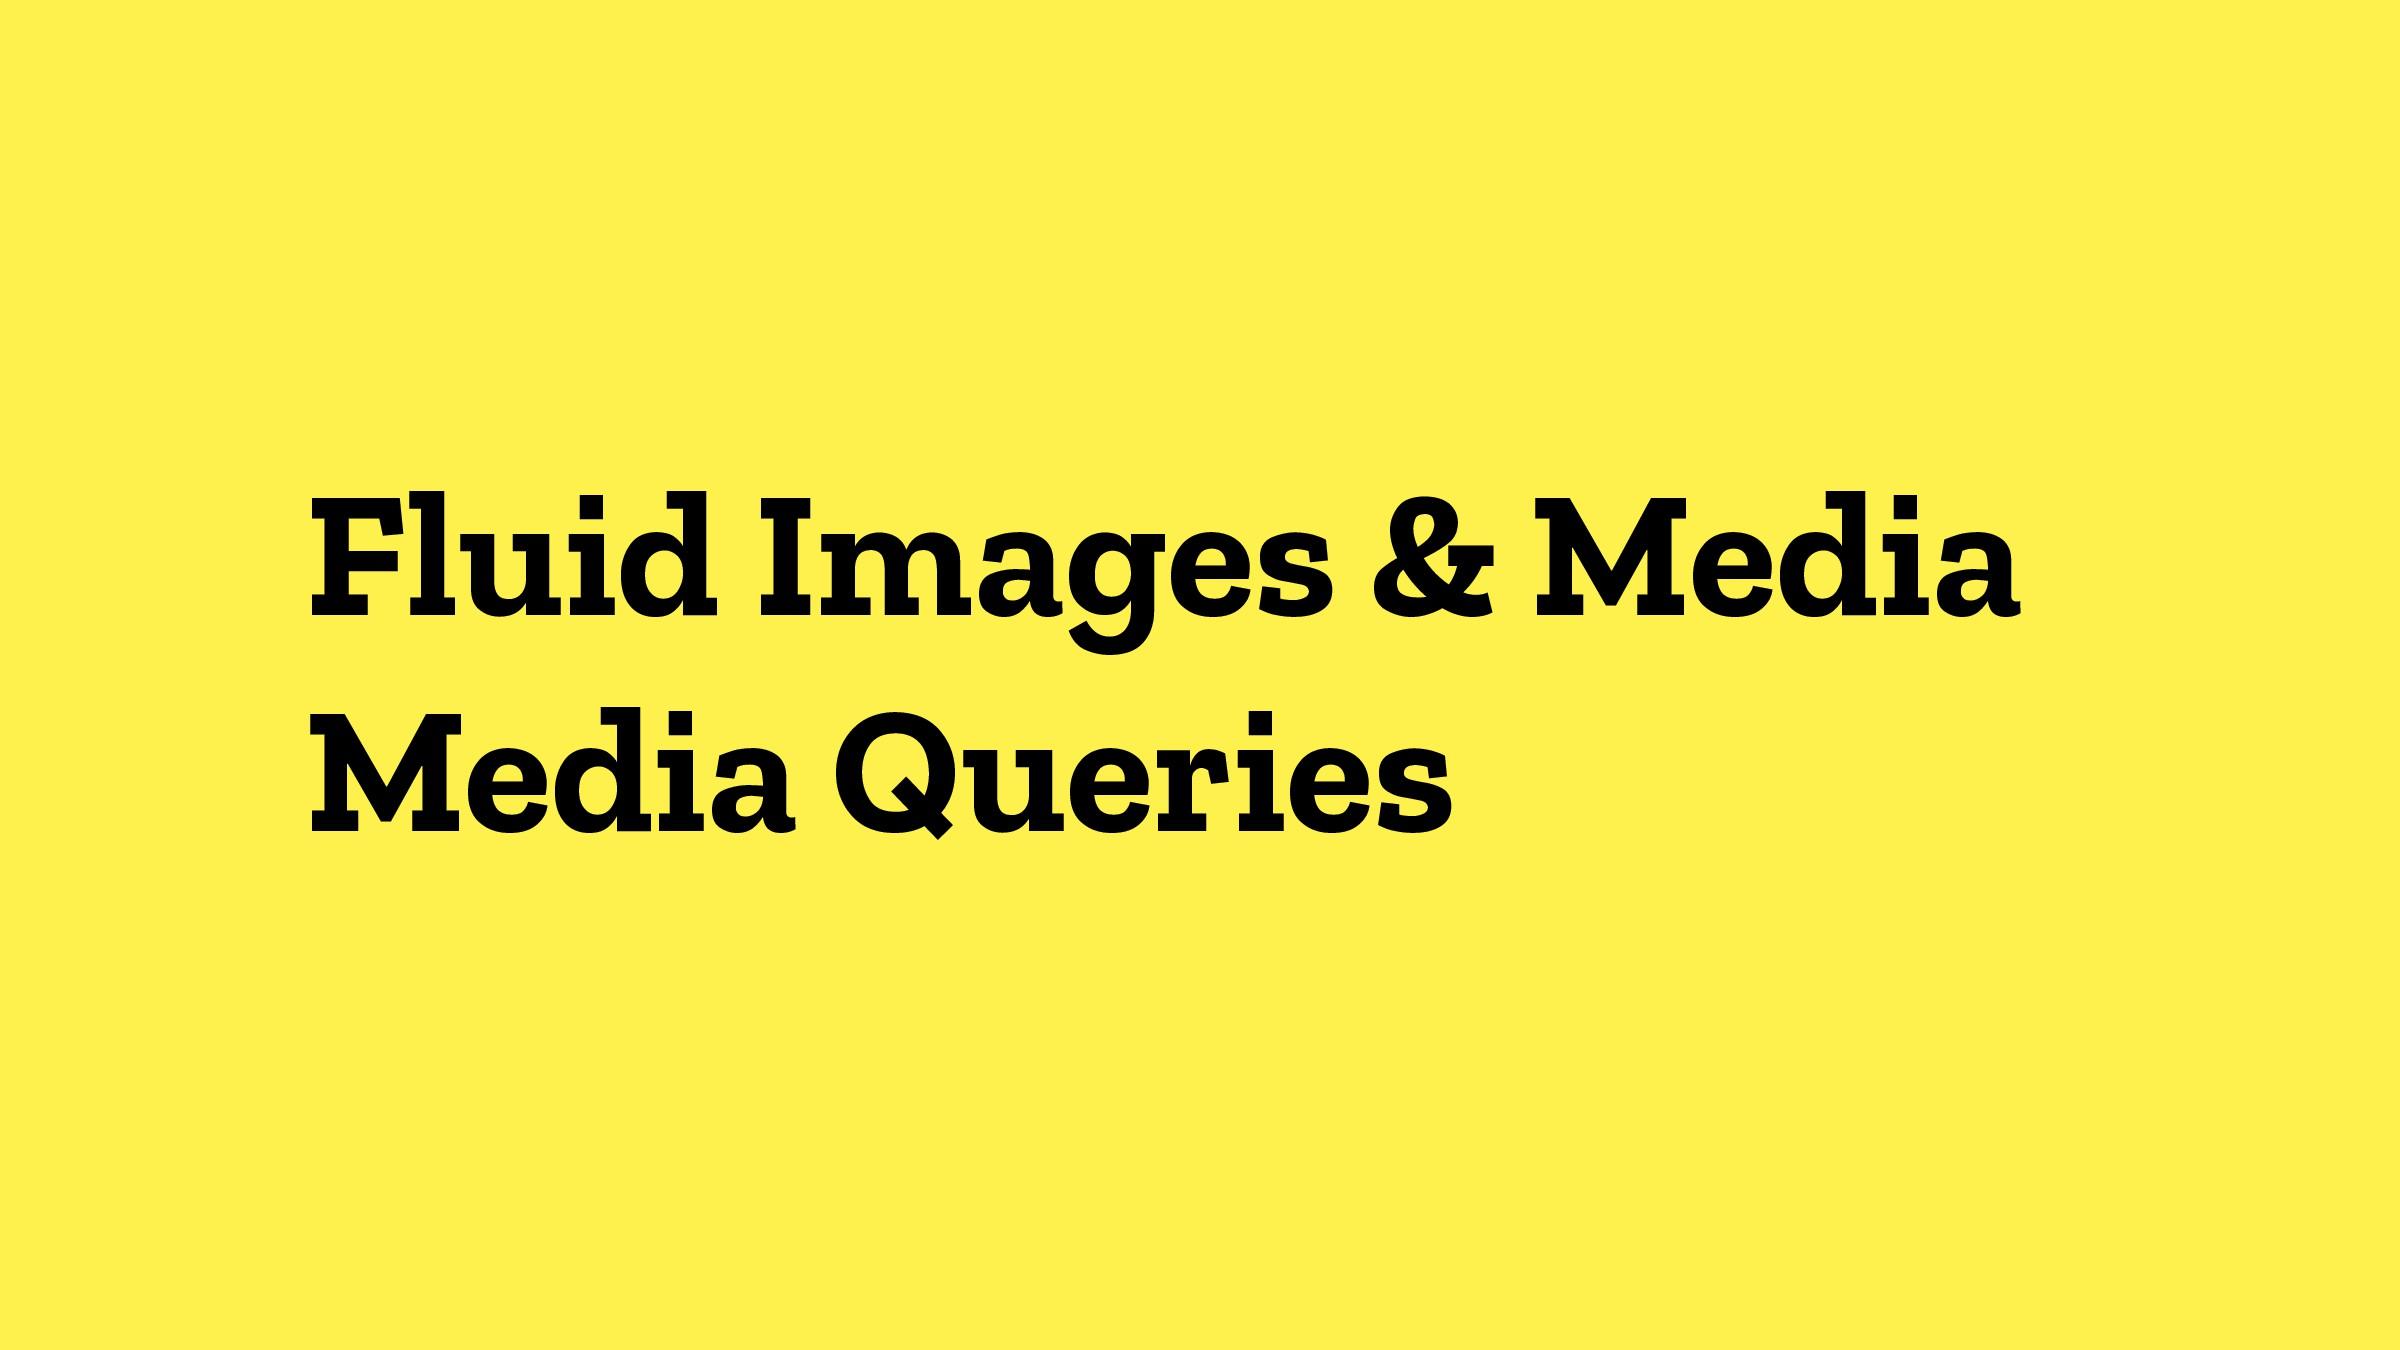 Fluid Images & Media Media Queries